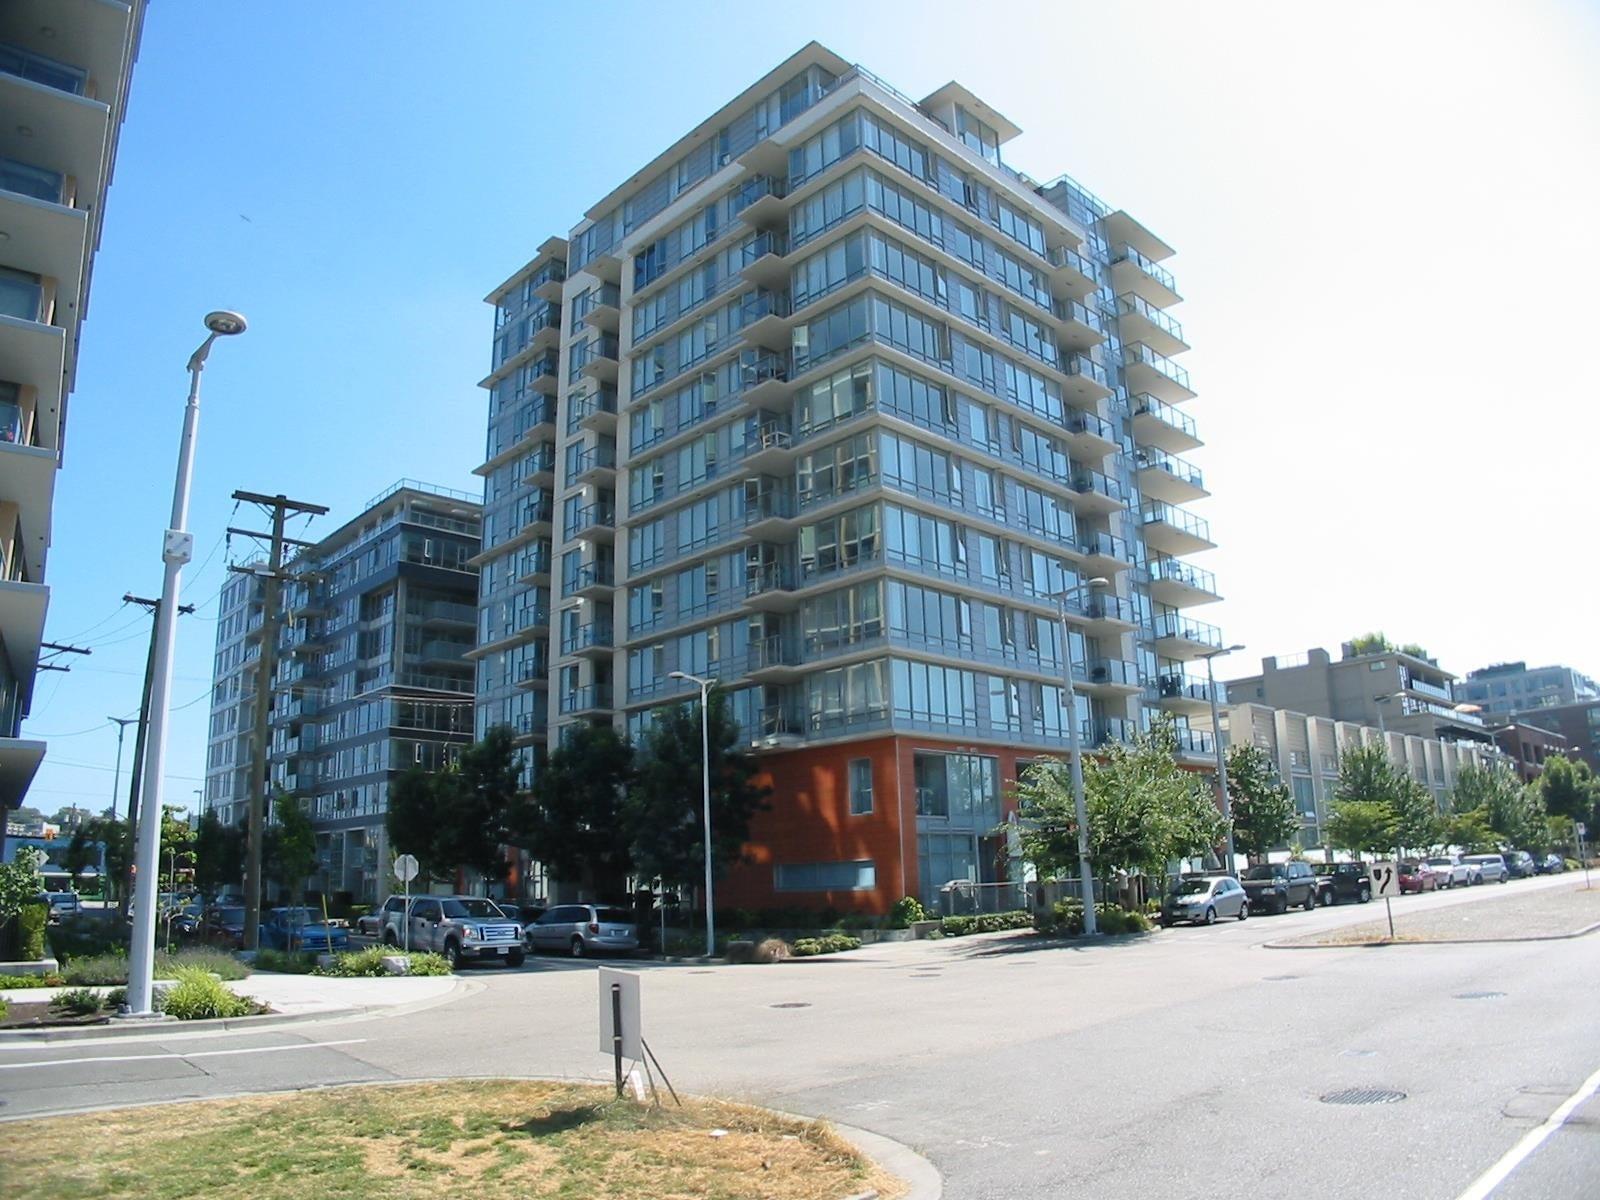 607 1833 CROWE STREET - False Creek Apartment/Condo for sale, 2 Bedrooms (R2621498) - #1